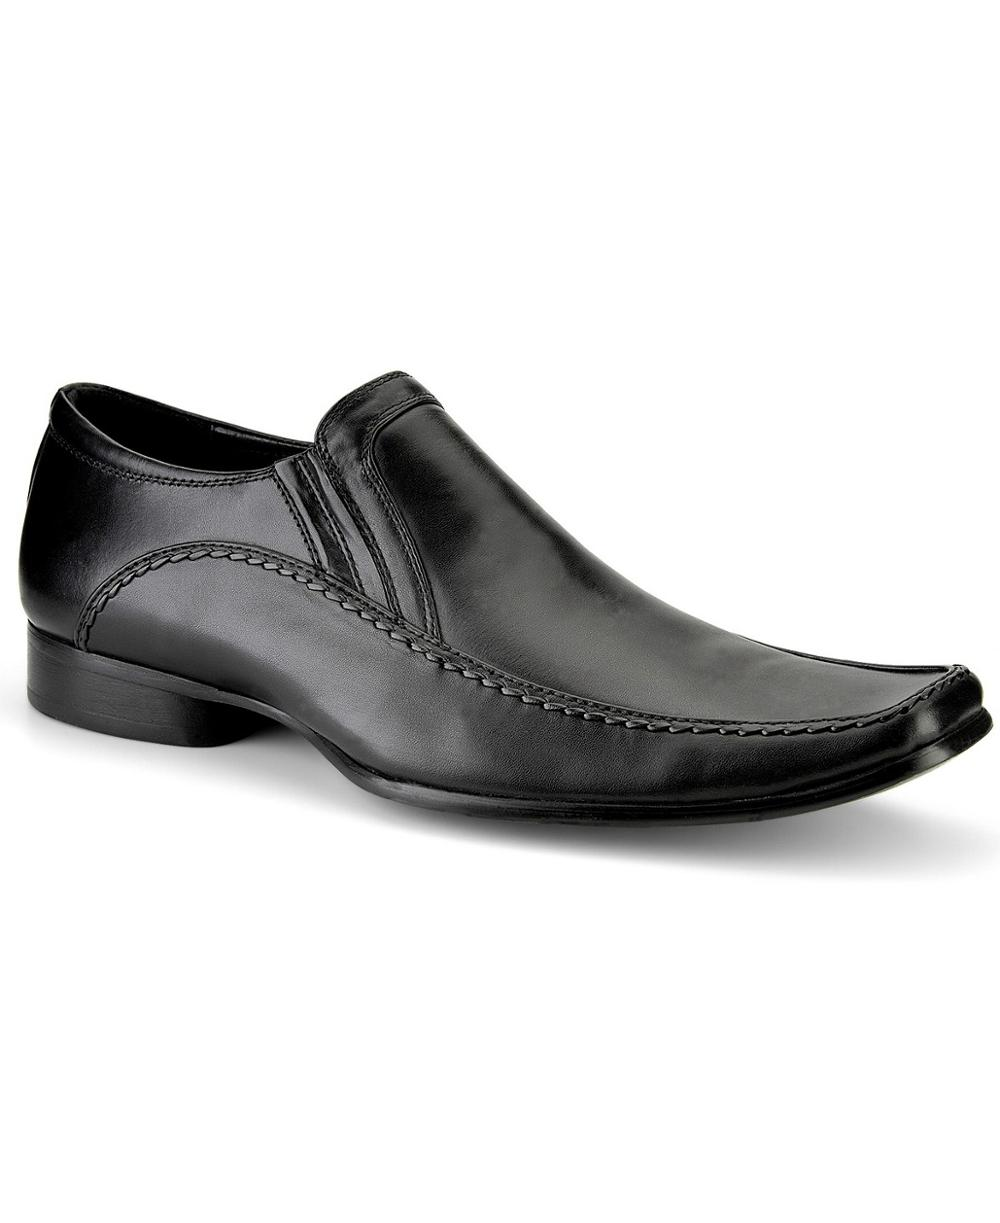 Shoes Heel Handmade Branded Formal for Men Hidden xz6nTFq1w